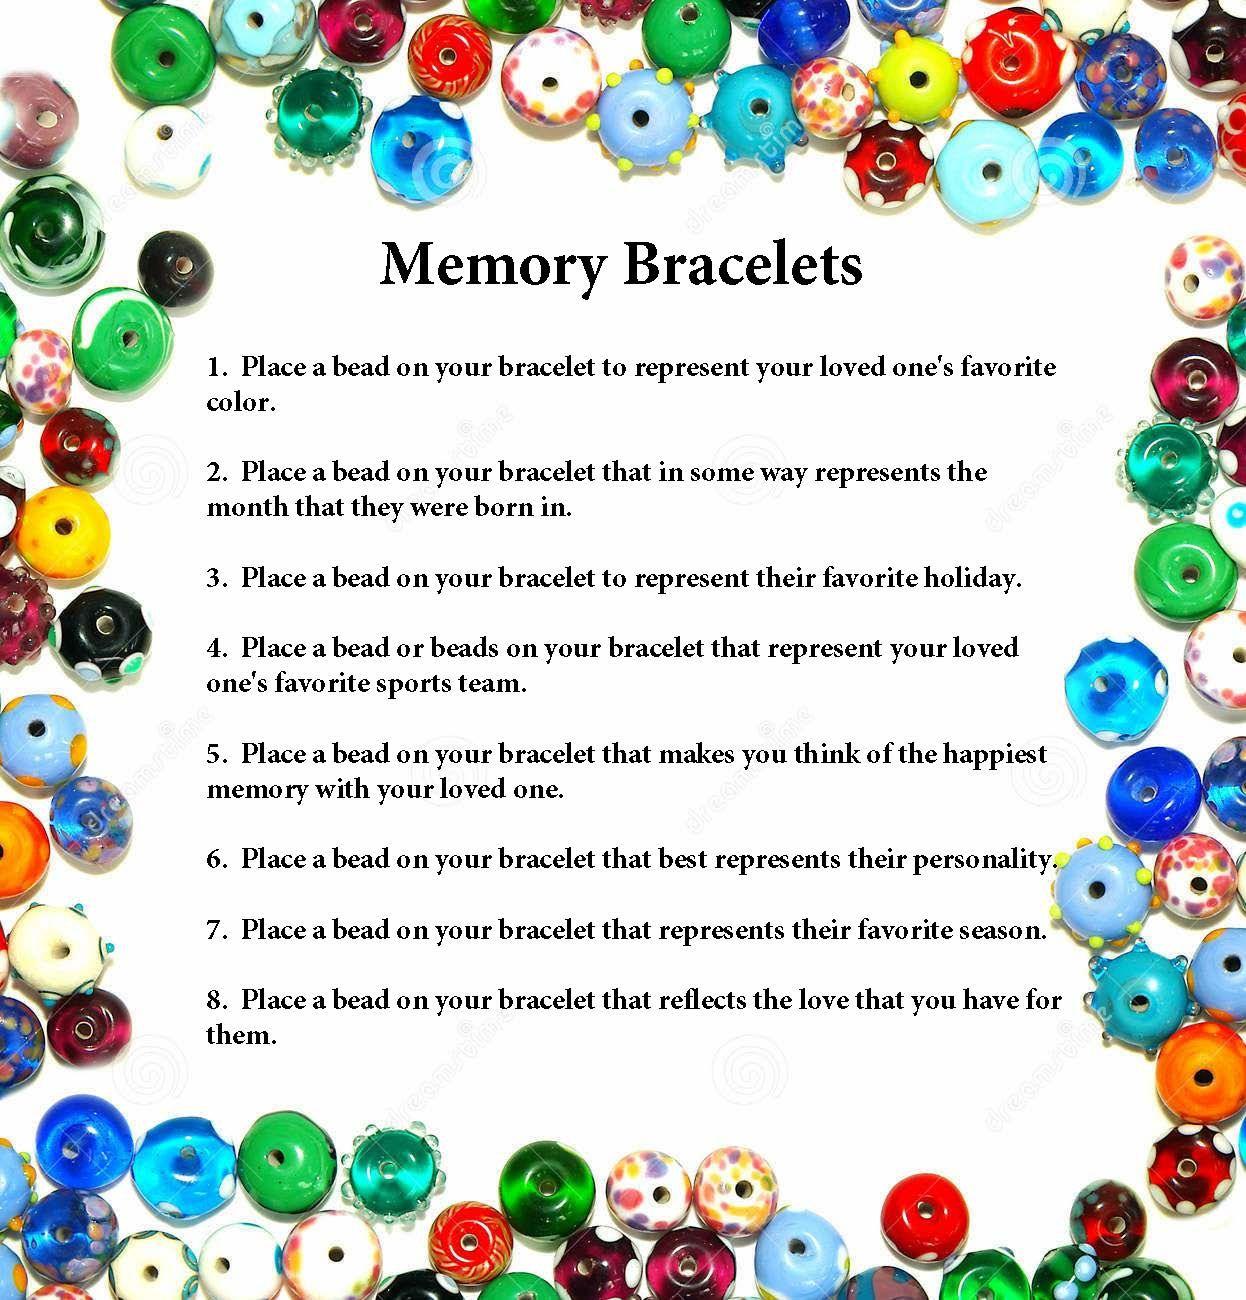 how to get skyrim to use more memory